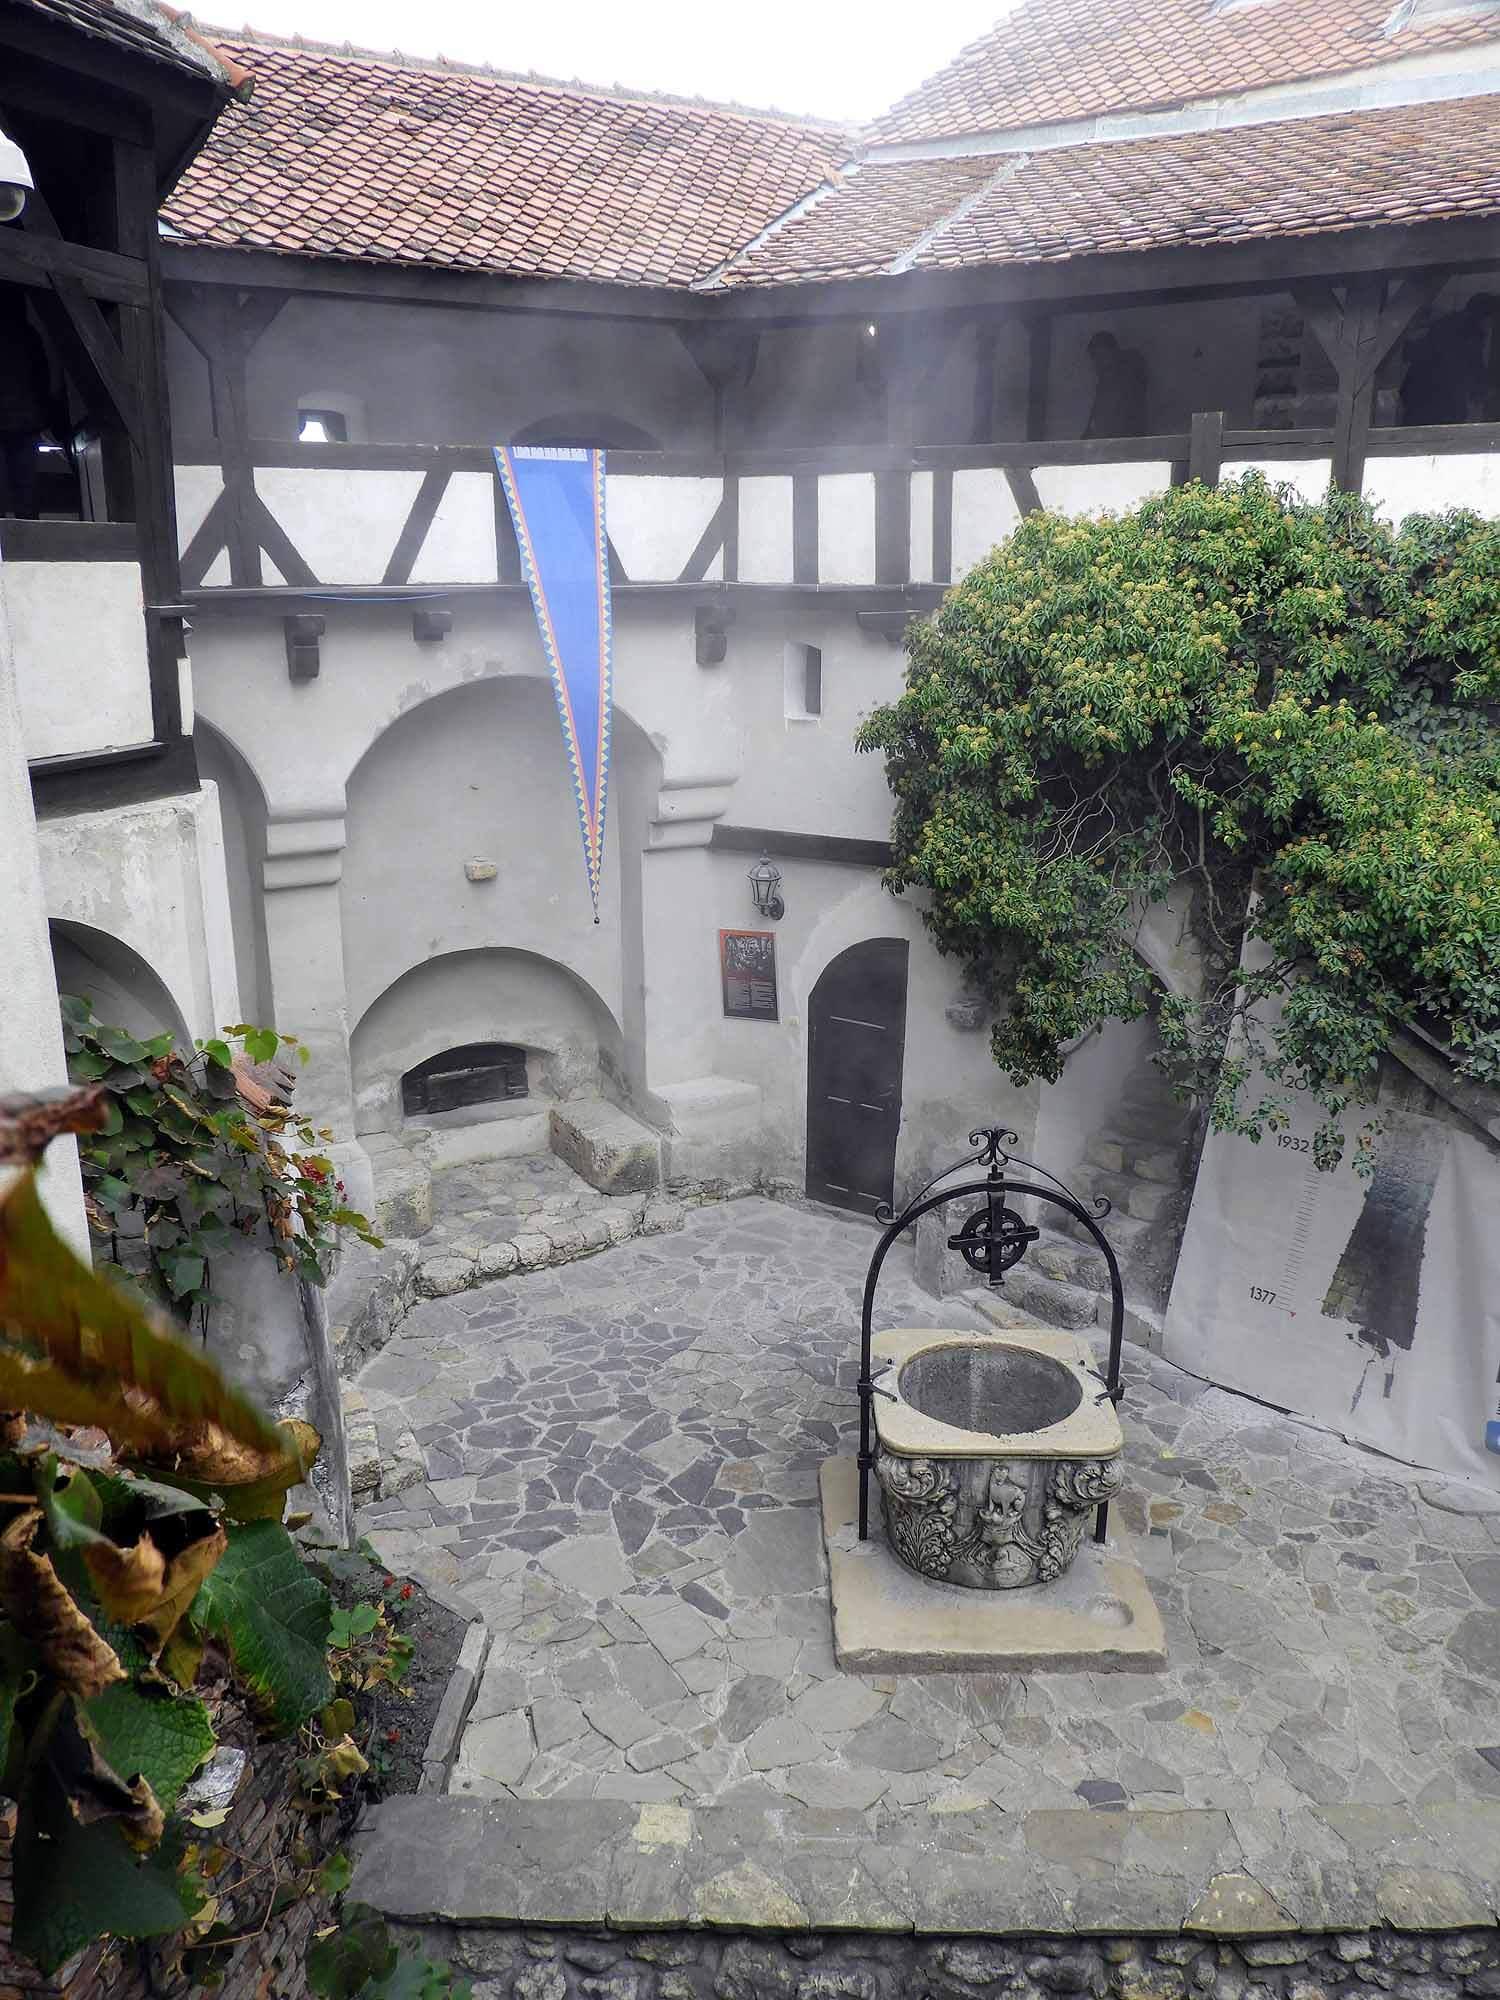 romania-bran-castle-courtyard-well.jpg